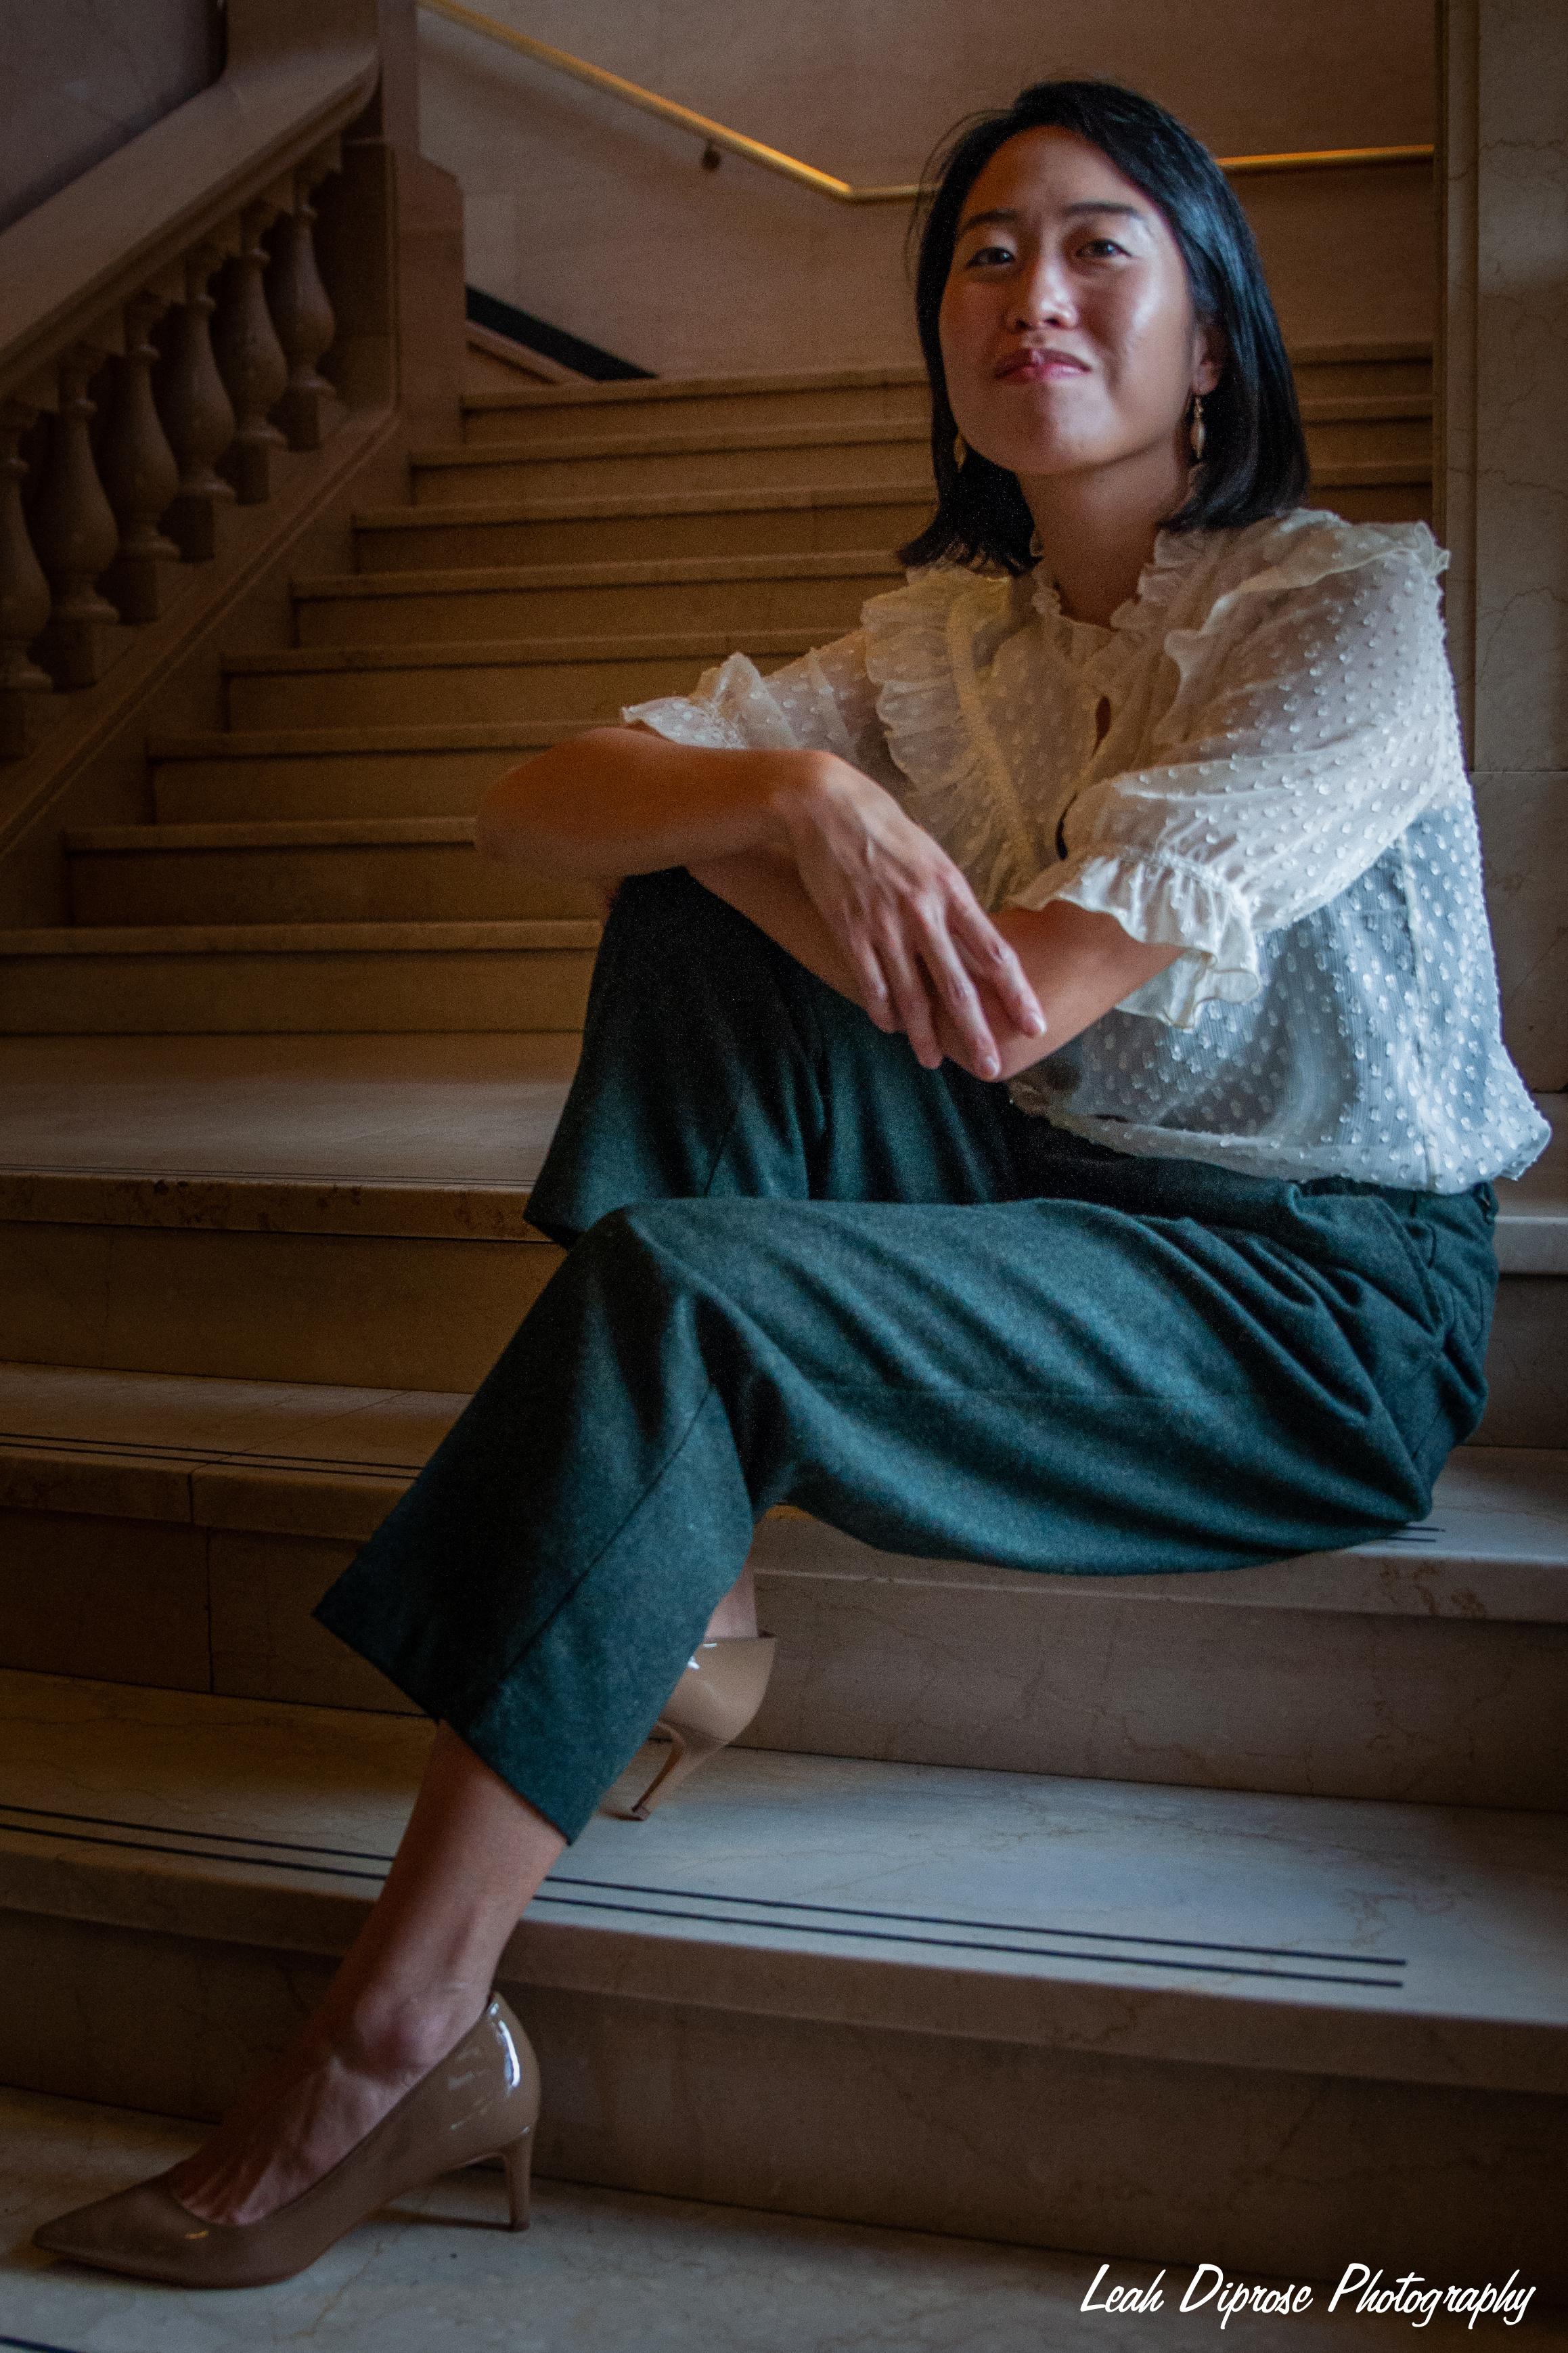 Leah Diprose Photography image-0601.jpg